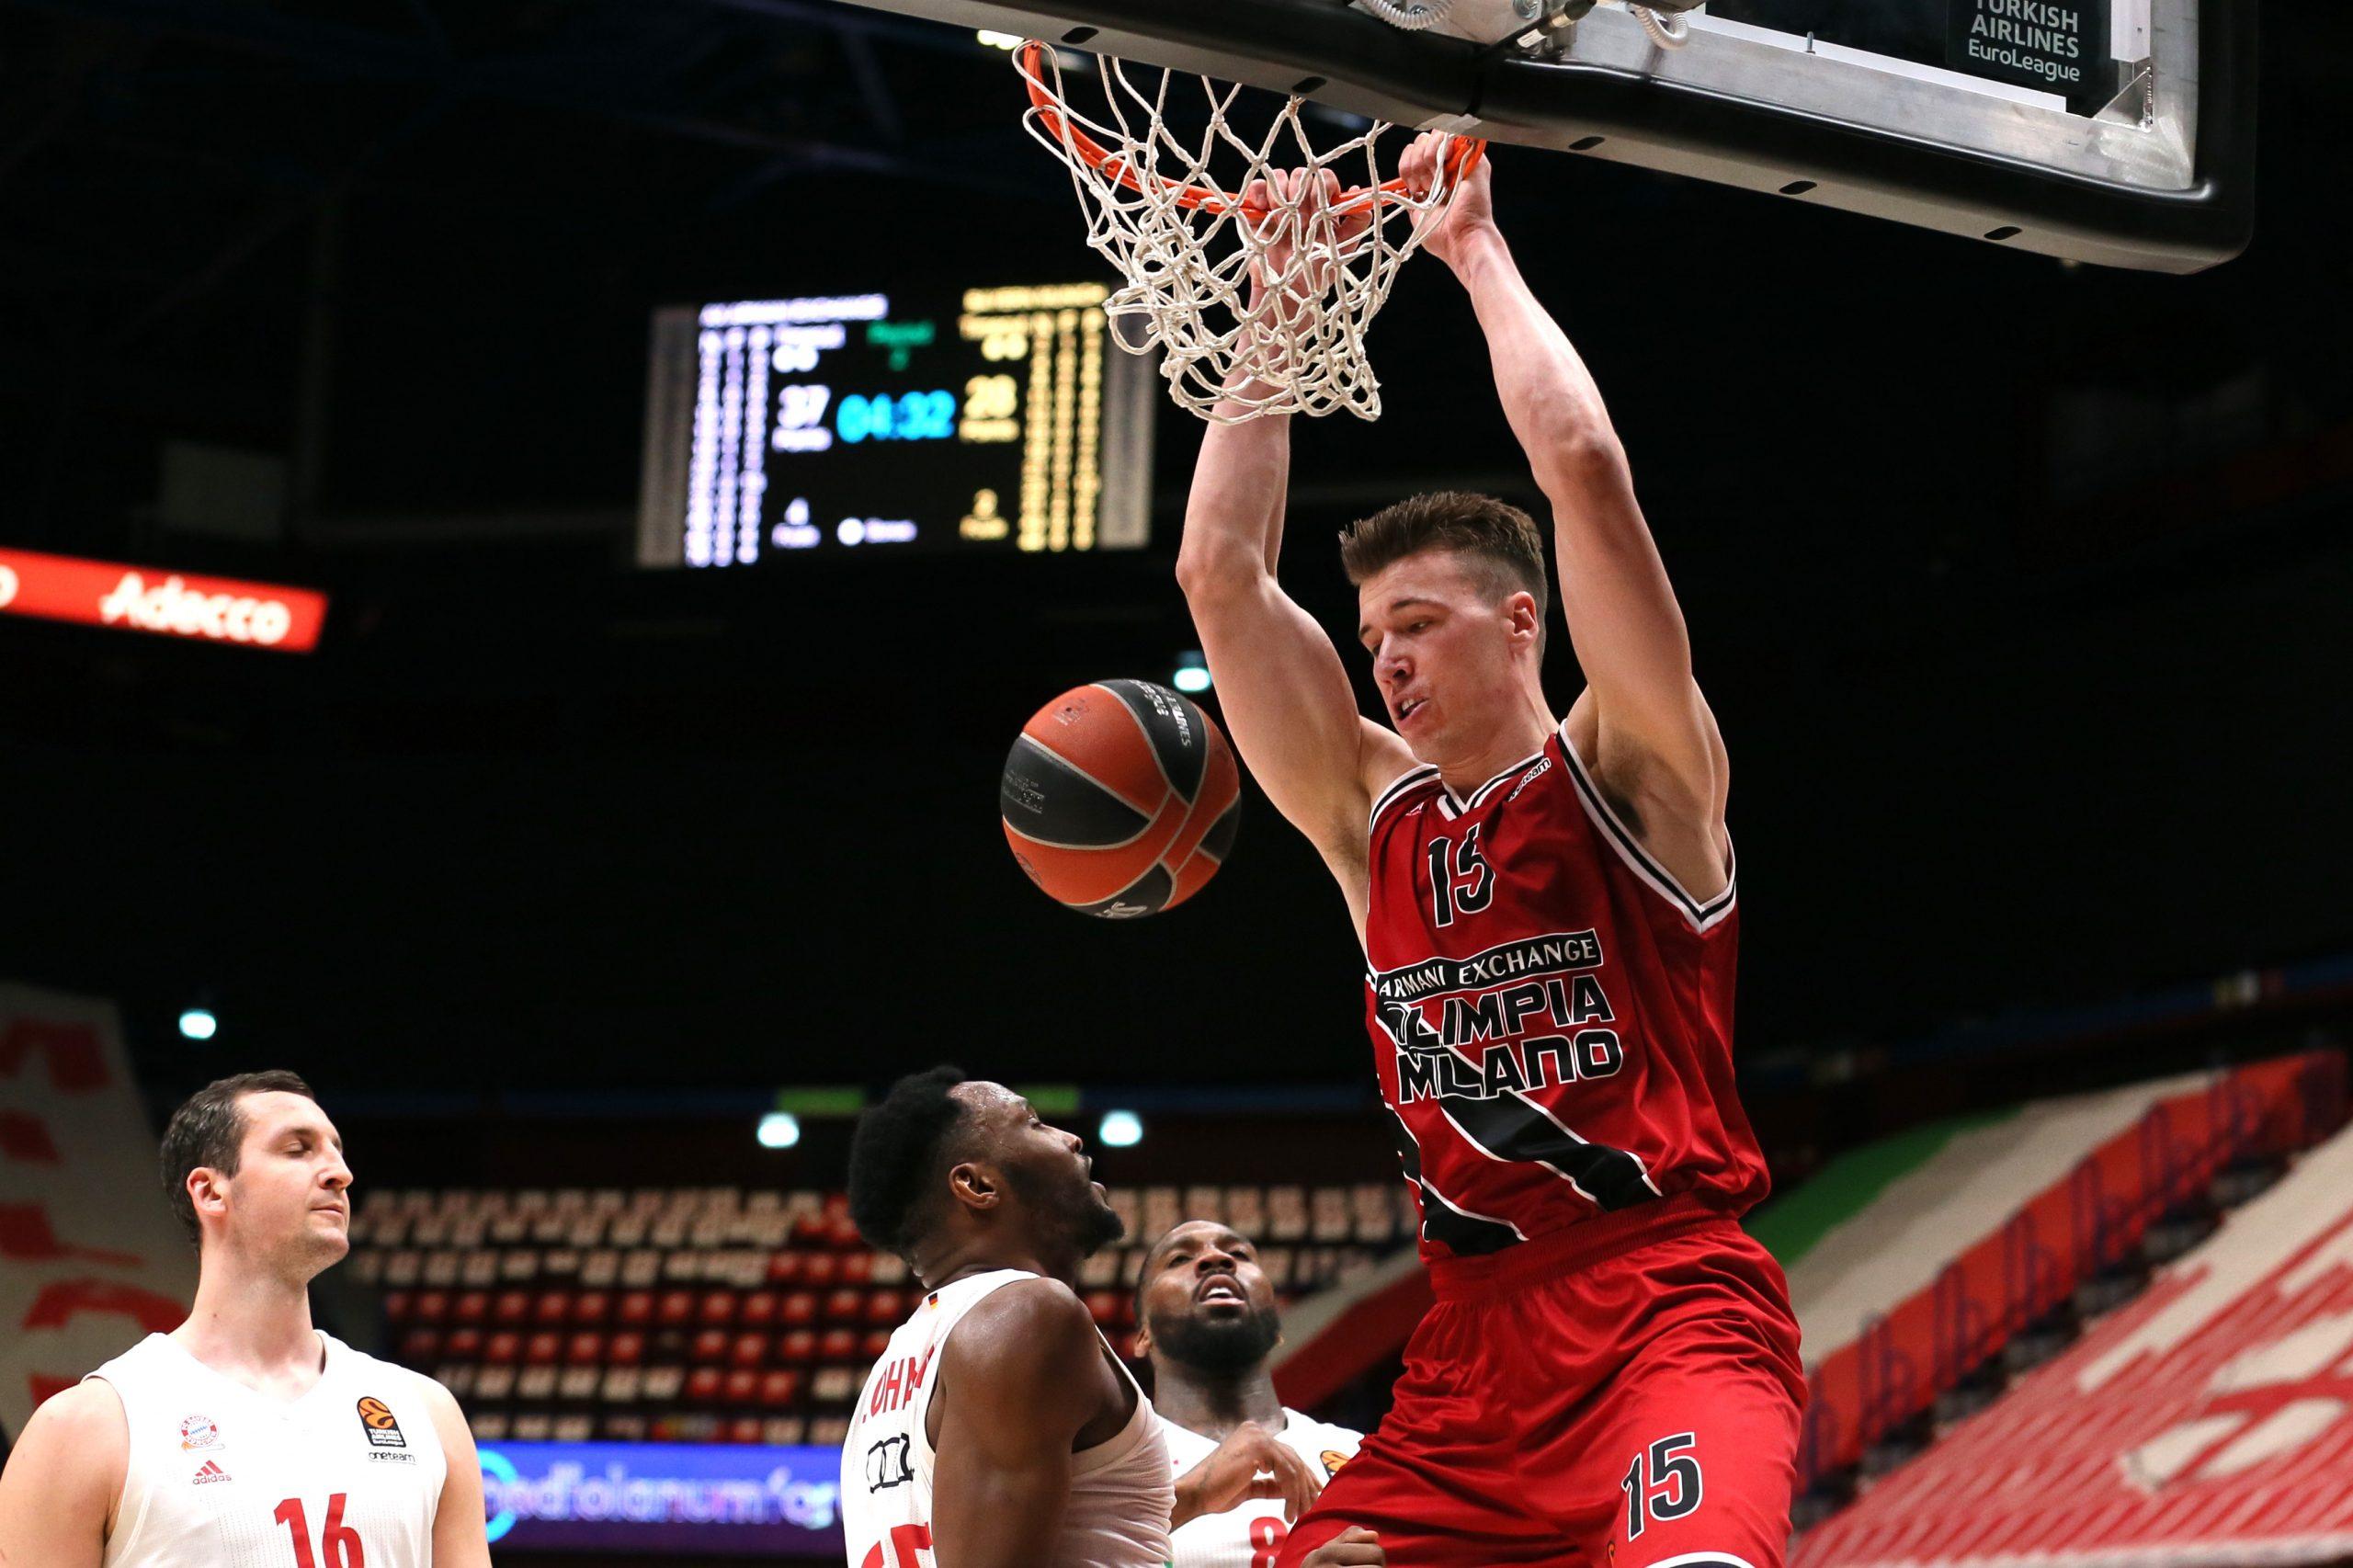 Giuseppe Cottini/Euroleague Basketball via Getty Images